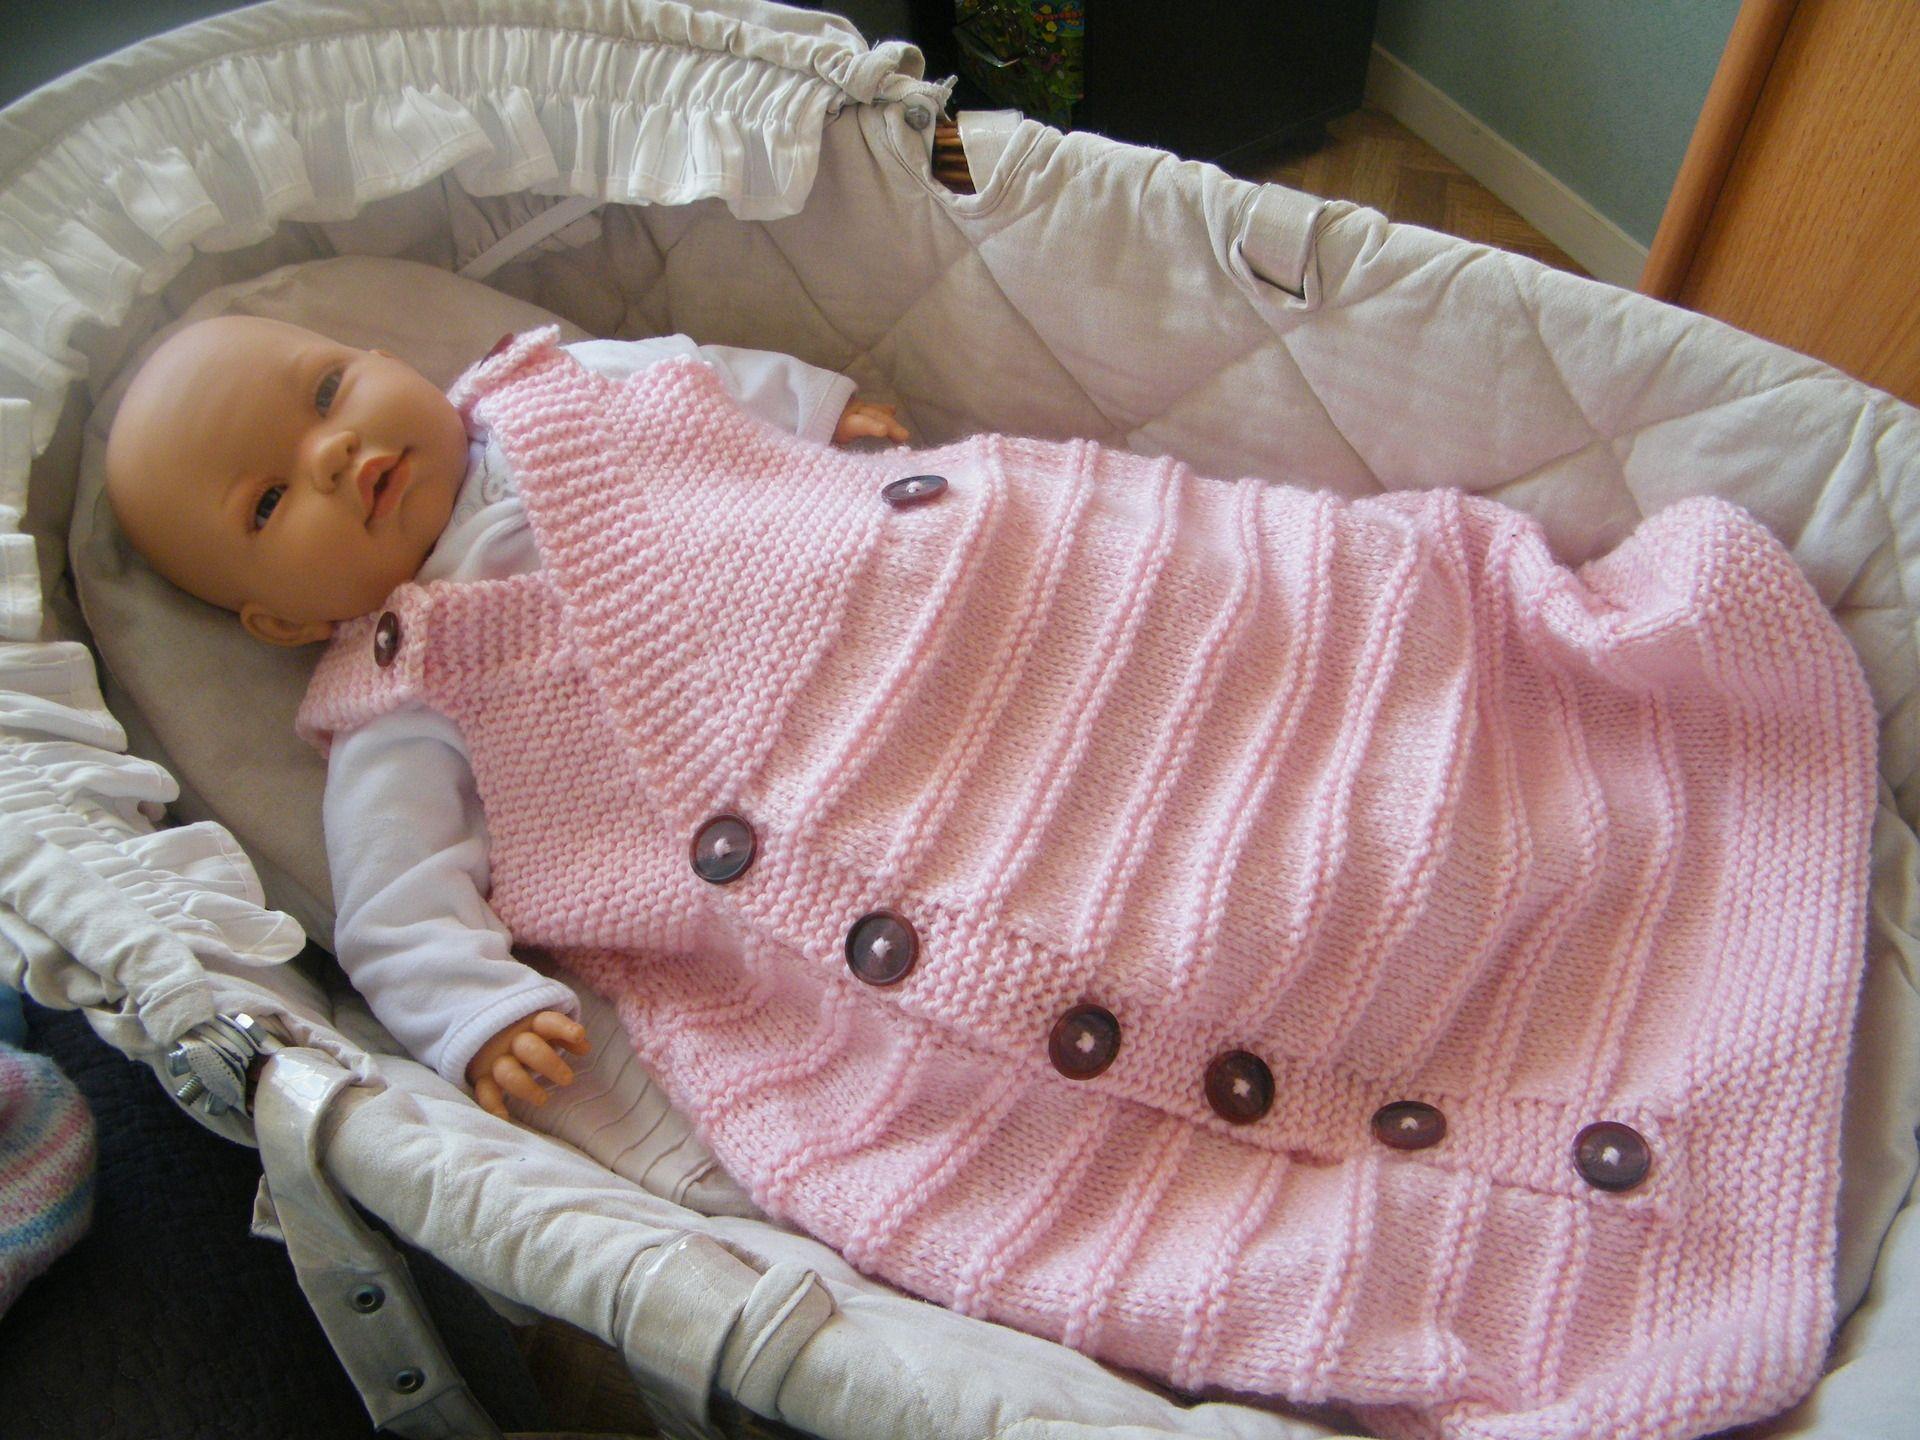 Sehr gigoteuse turbulette nidange tricoté laine rose 0/6 mois : Mode  WQ05